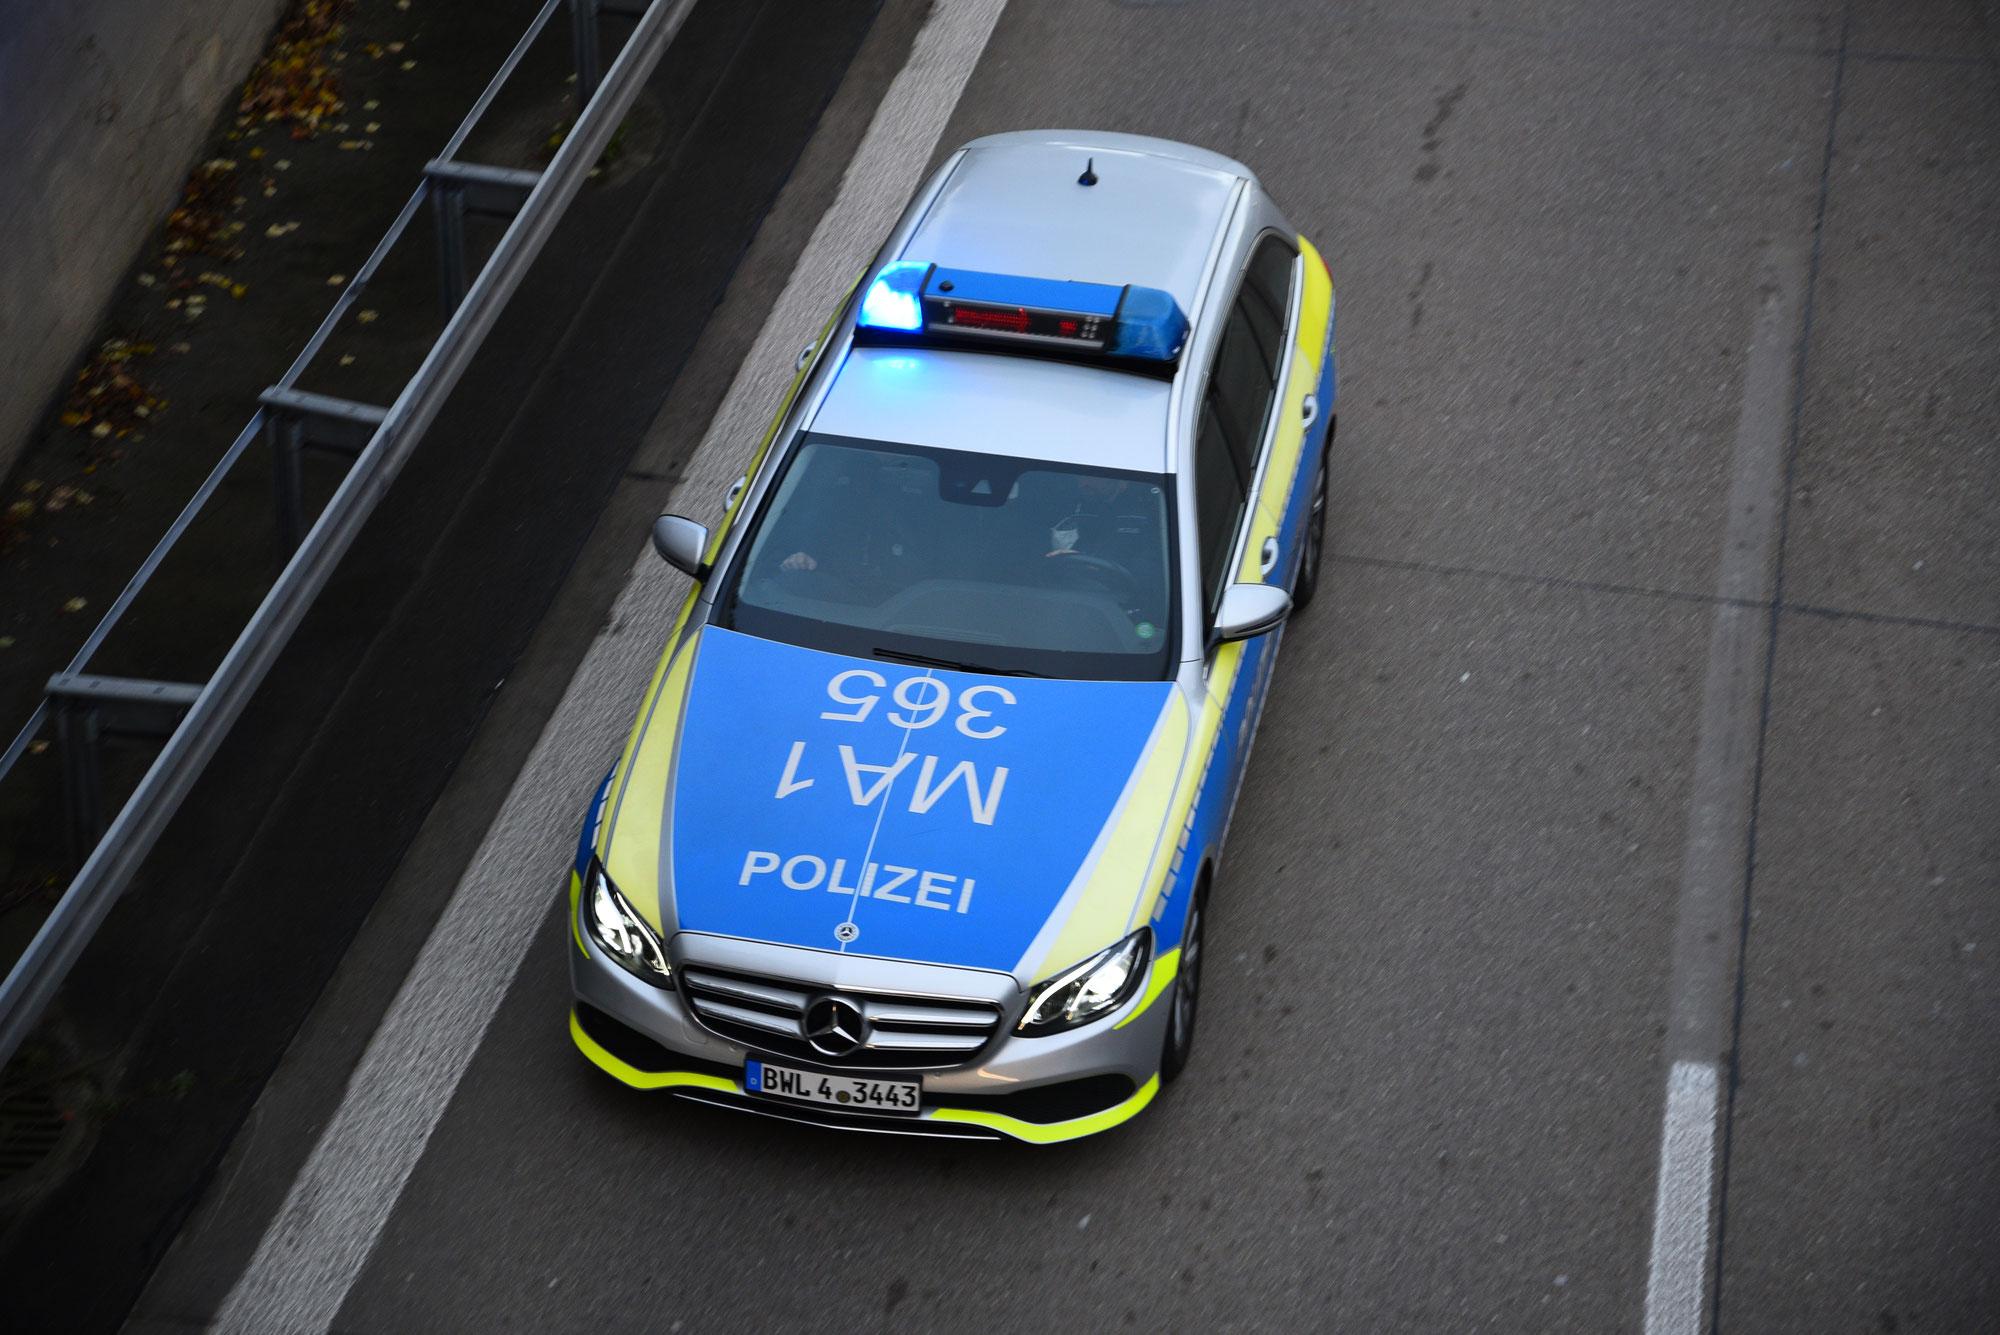 Sinsheim/Rhein-Neckar-Kreis: Rücksichtsloser Autofahrer gefährdet andere Verkehrsteilnehmer